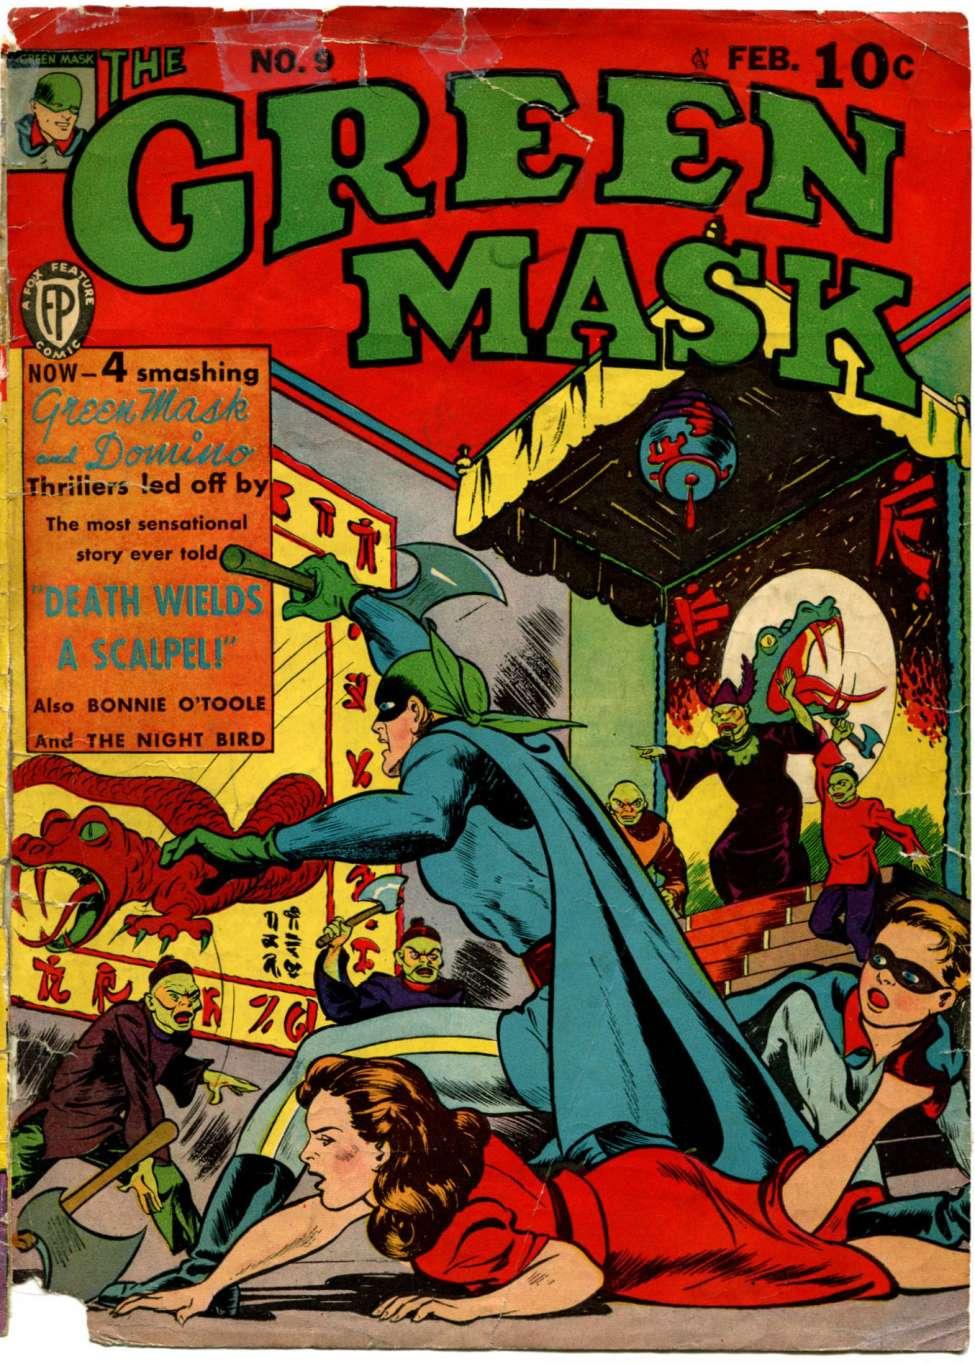 Green Mask, The (1940) #9, cover by Joe Simon.